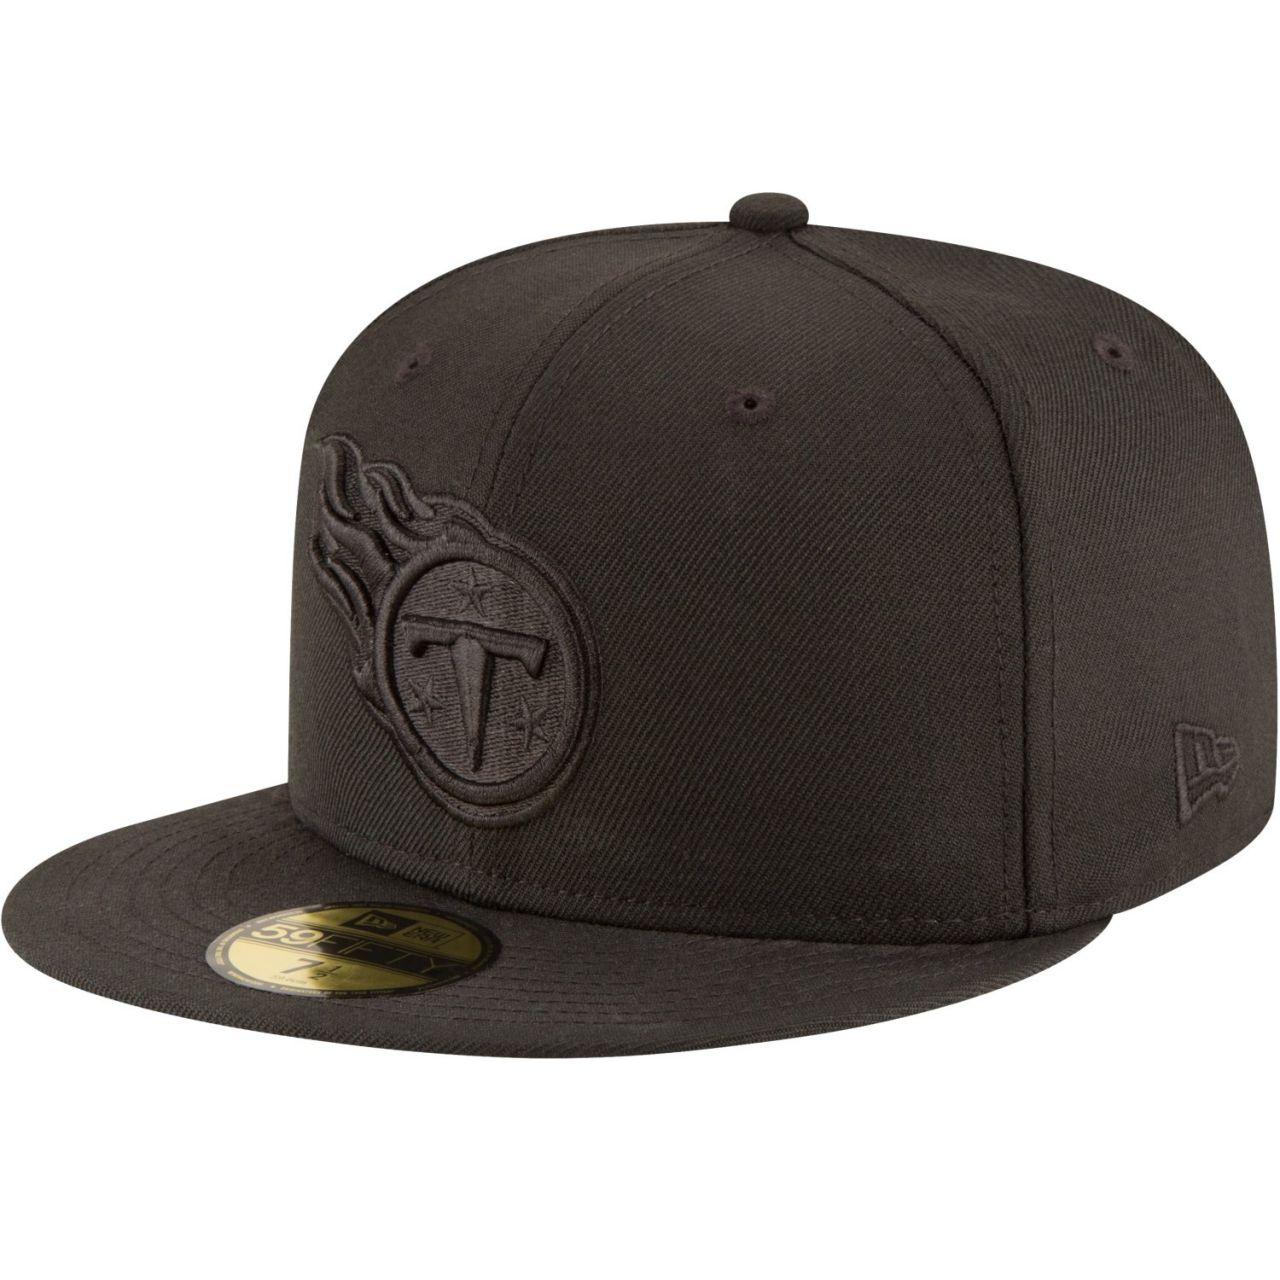 amfoo - New Era 59Fifty Cap - NFL BLACK Tennessee Titans